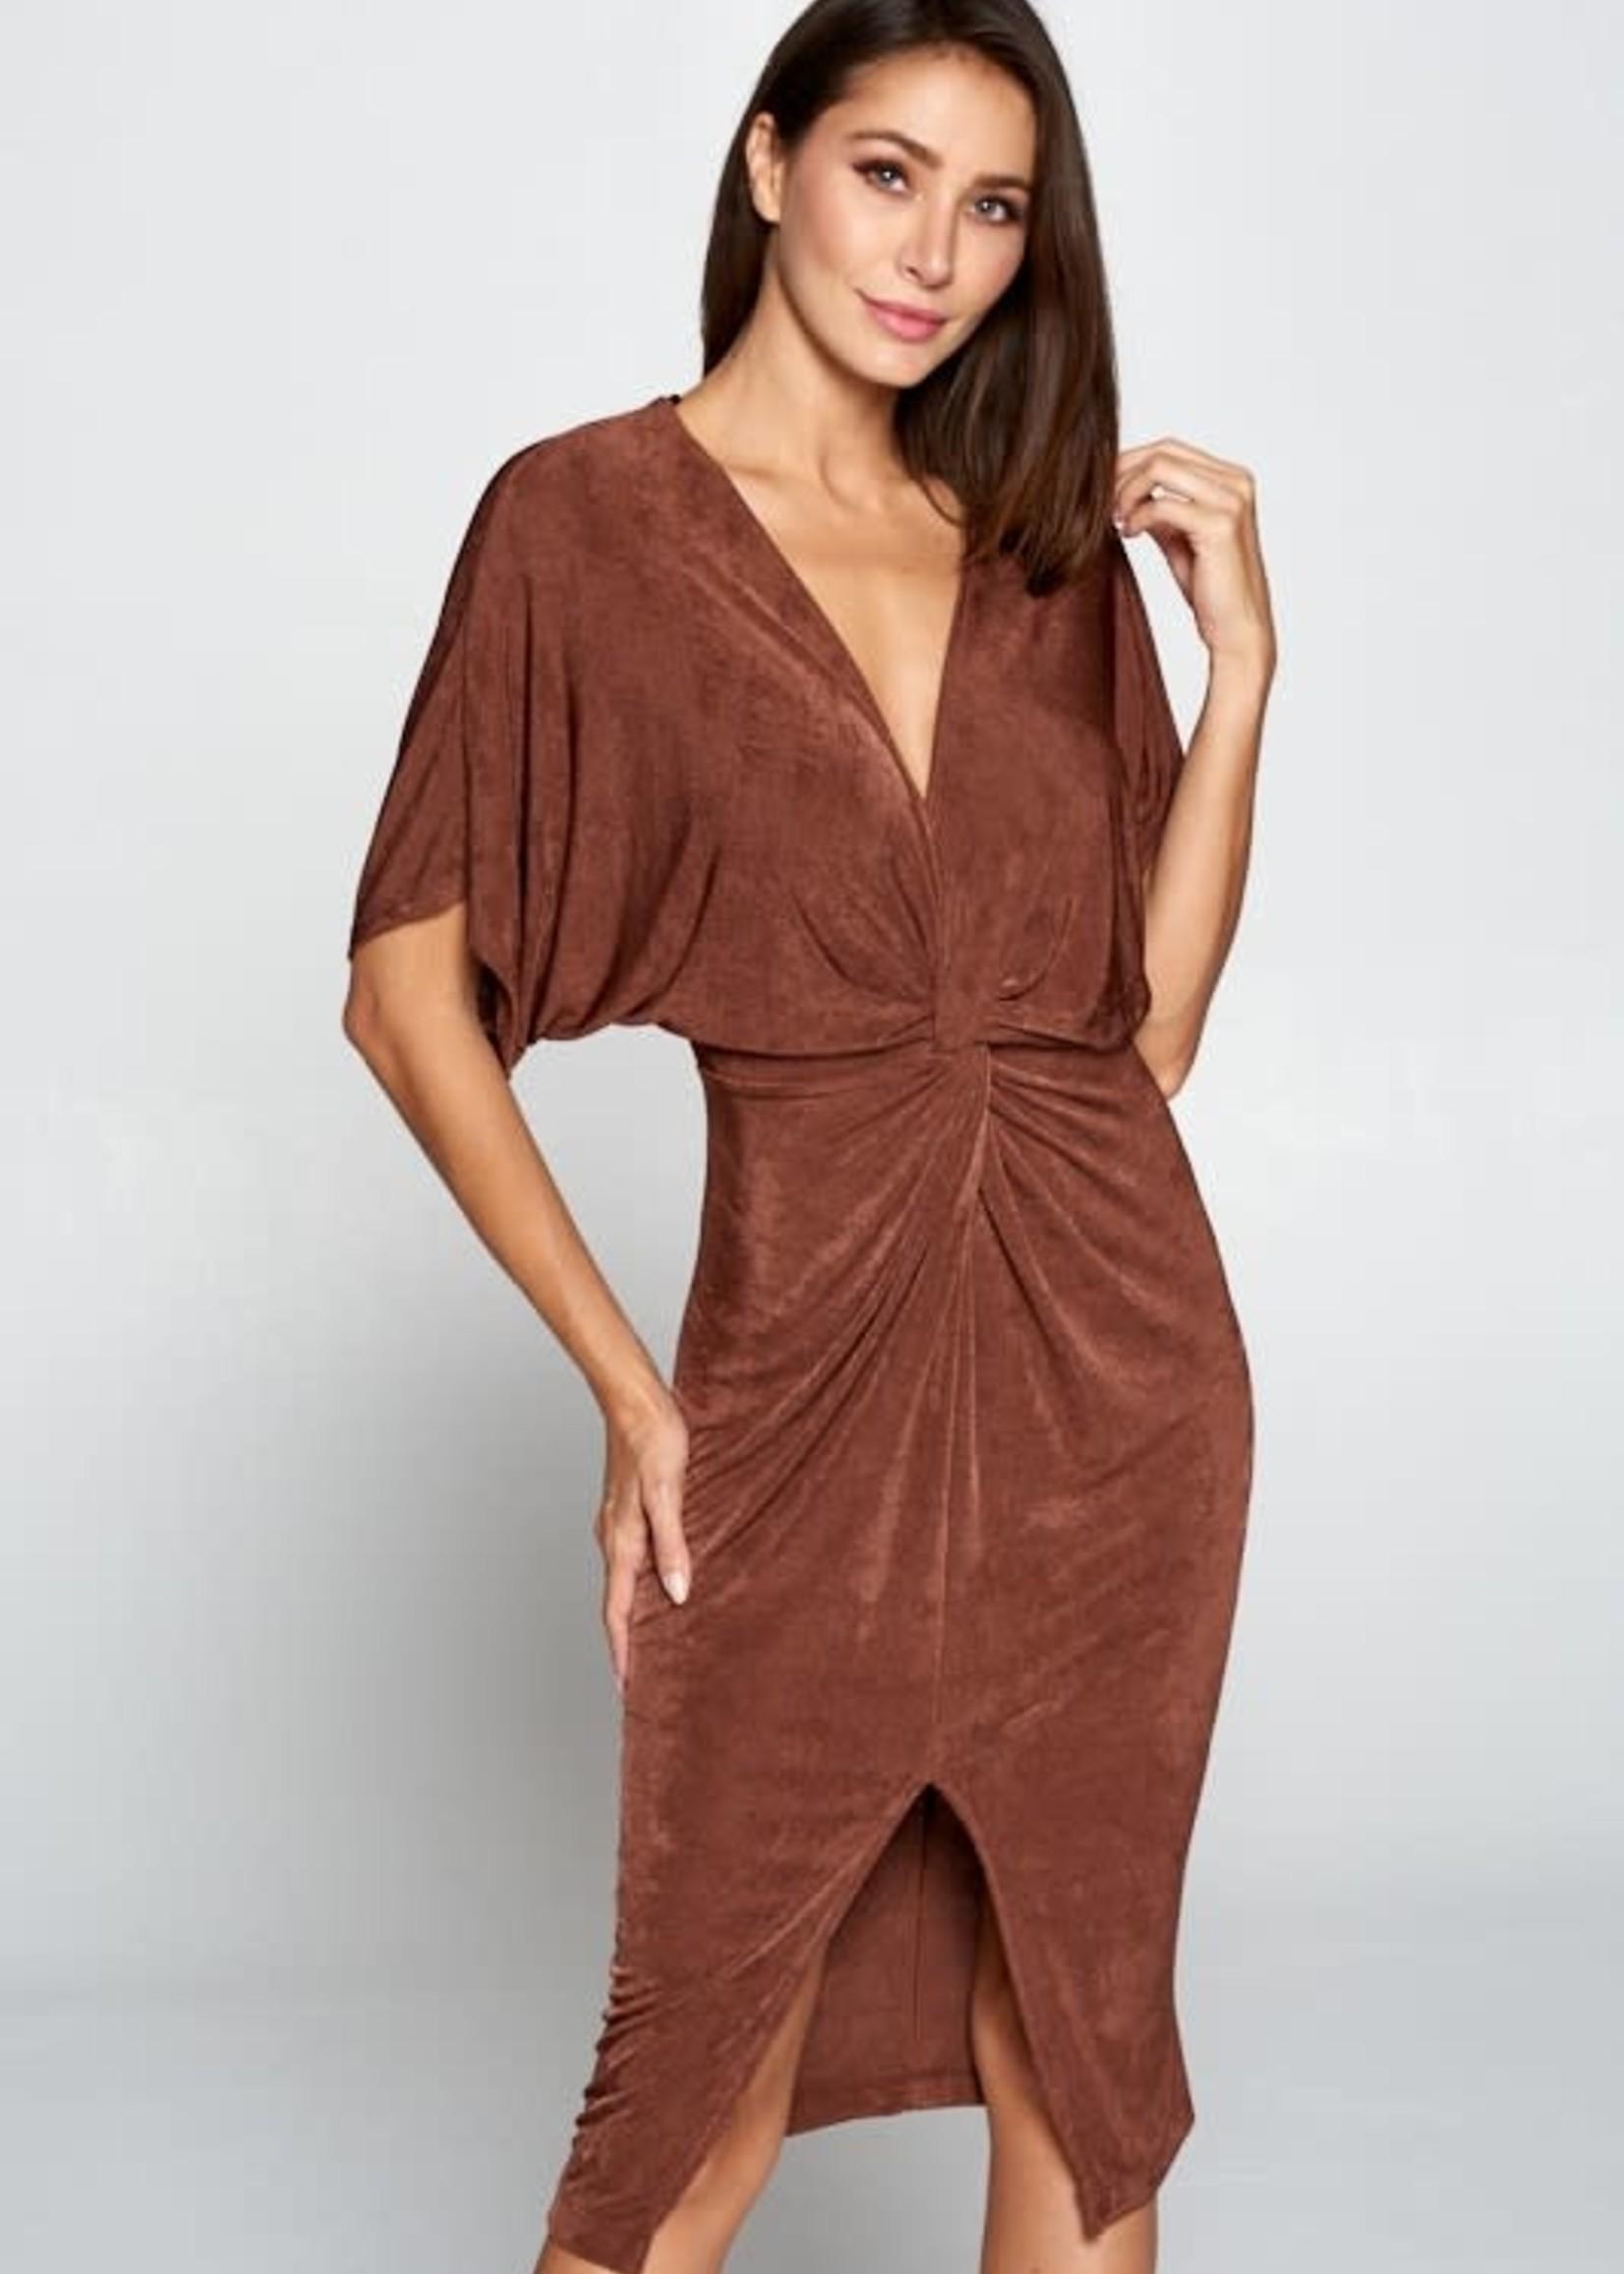 Get Dressed Up Midi Dress (3 Colors)